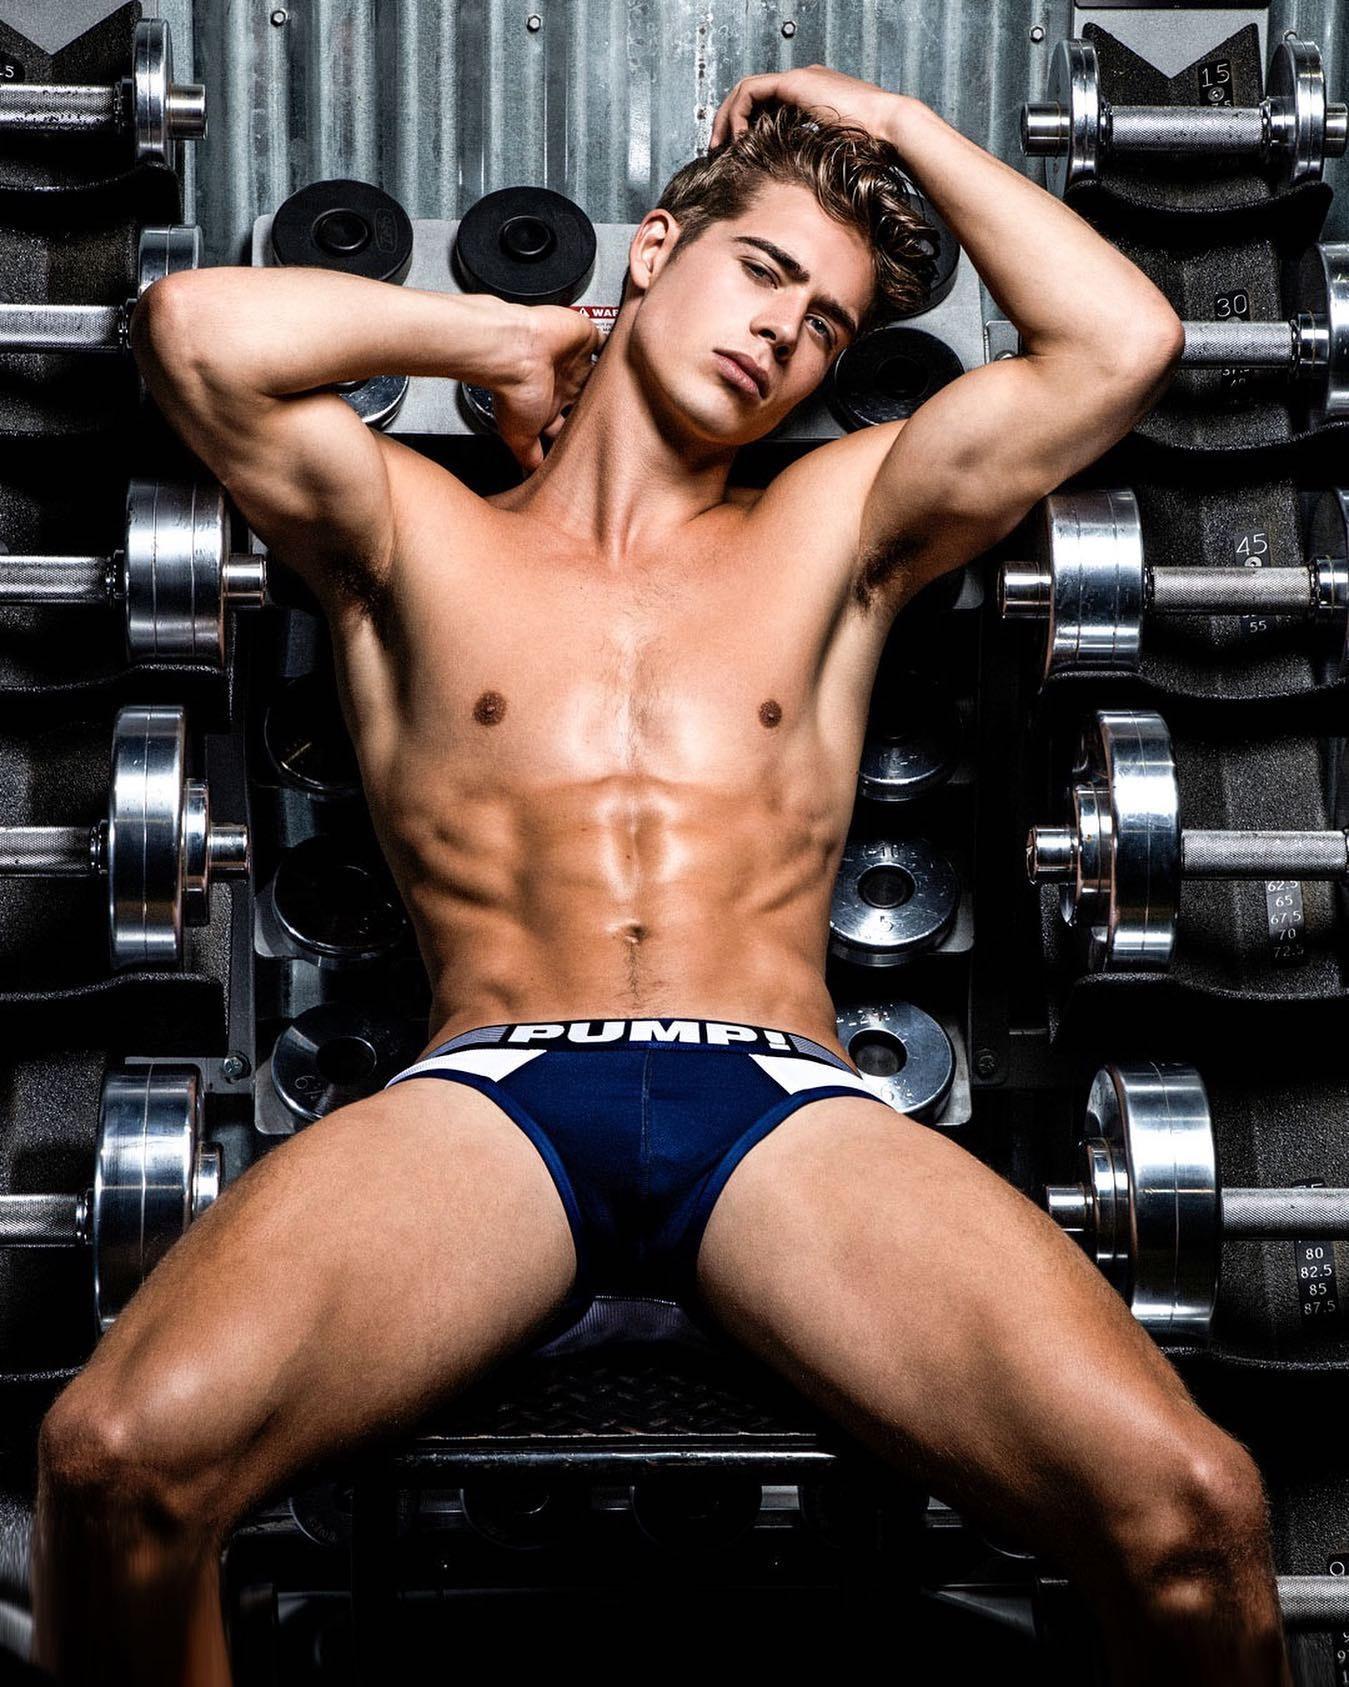 #men #underwear #sixpack #pump